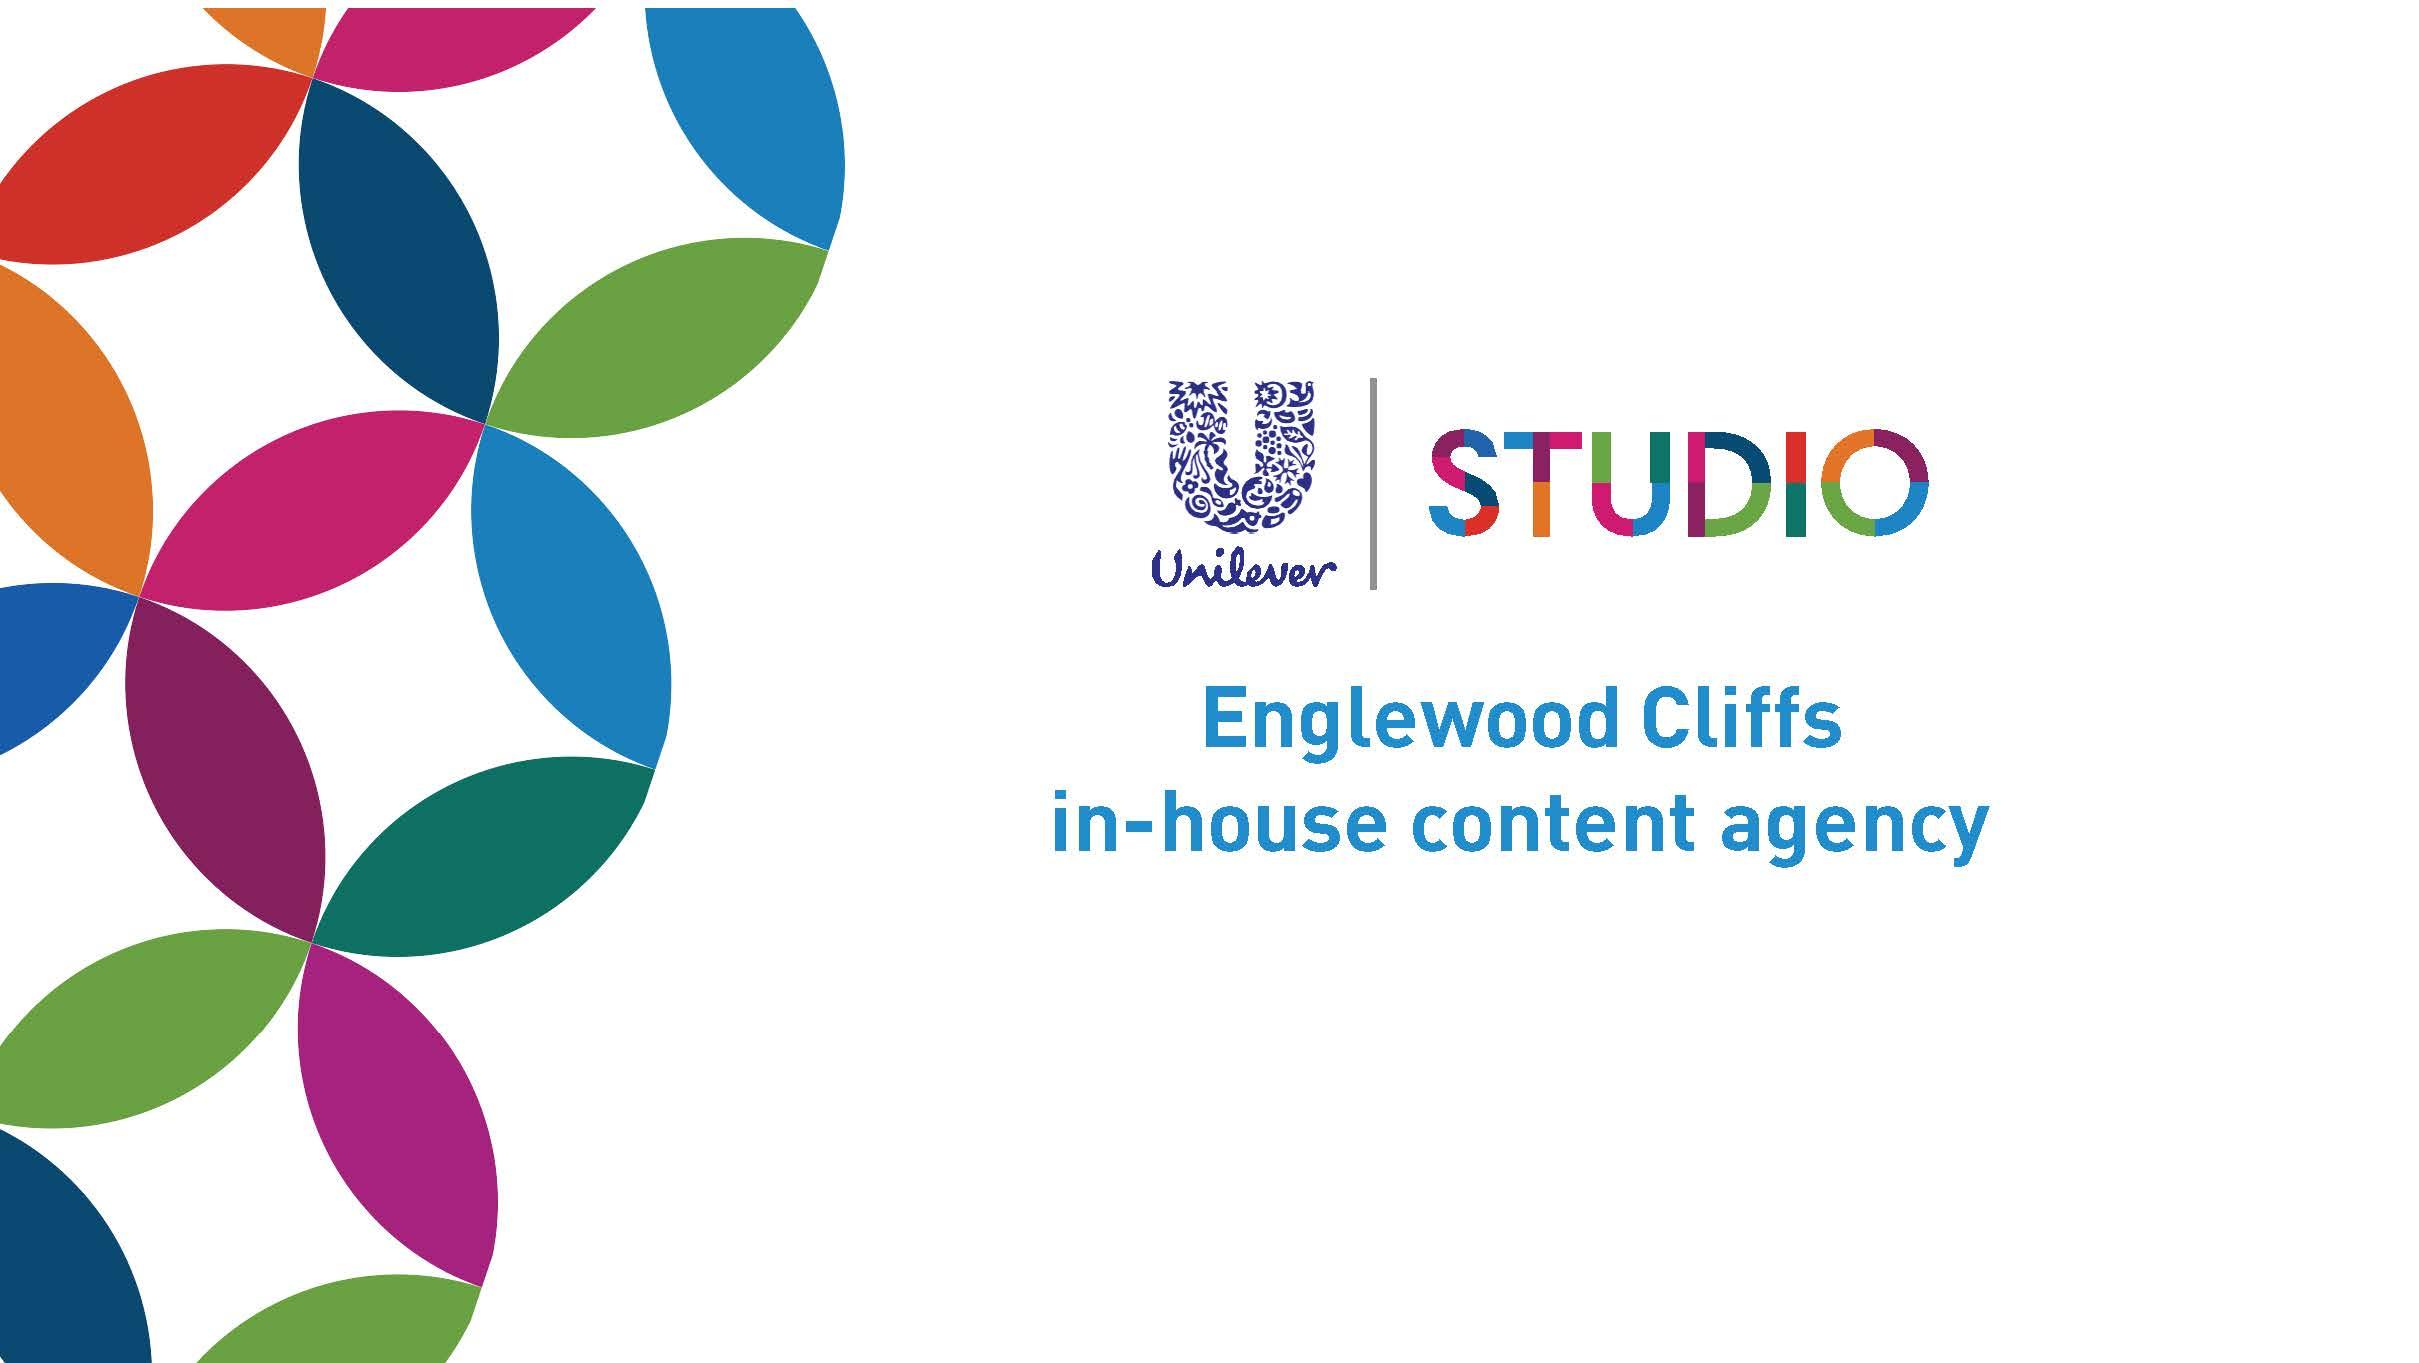 U STUDIO_Englewood Cliffs PRESENTATION _12.9_MLL_Page_01.jpg